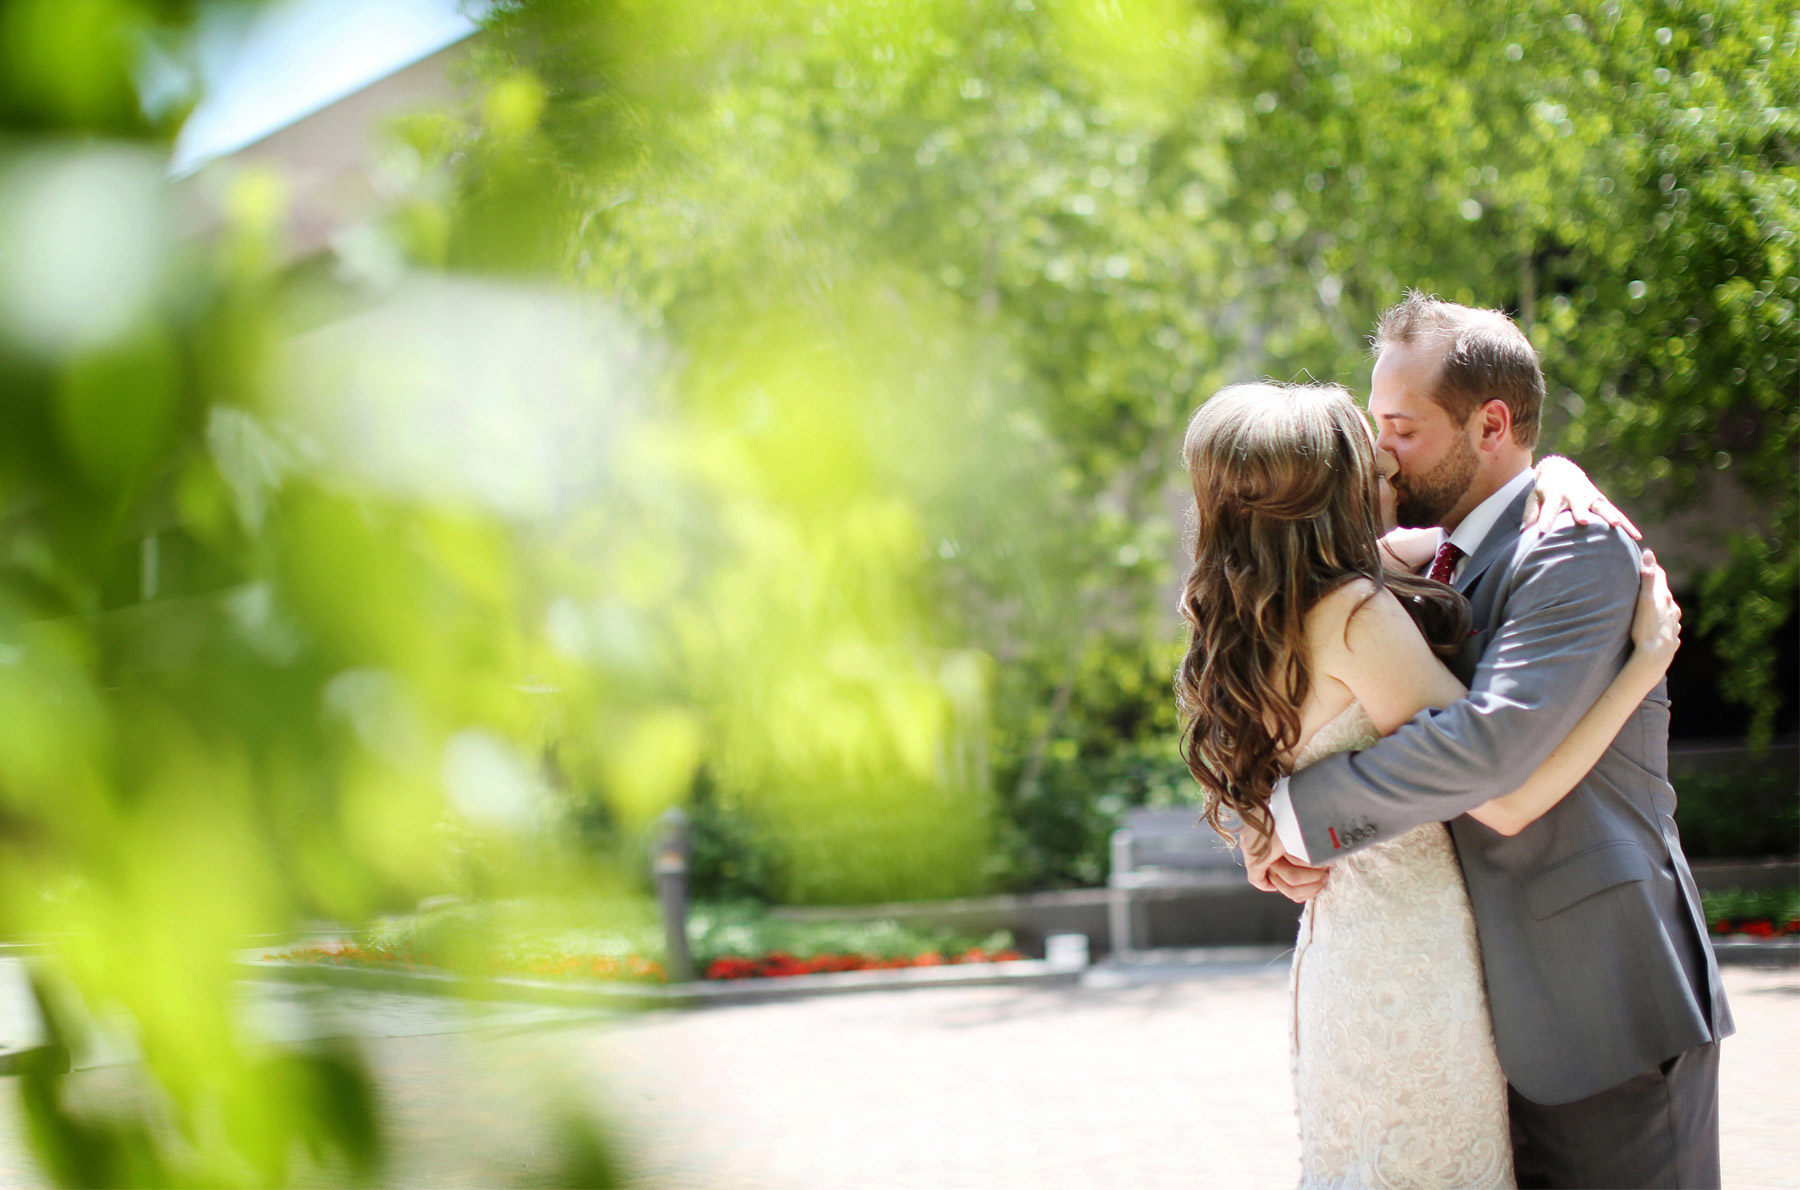 05-Minneapolis-Minnesota-Wedding-Photographer-by-Andrew-Vick-Photography-Summer-Edina-Westin-Hotel-First-Meeting-Look-Kiss-Embrace-Bride-Groom-Natalie-and-Andrew.jpg